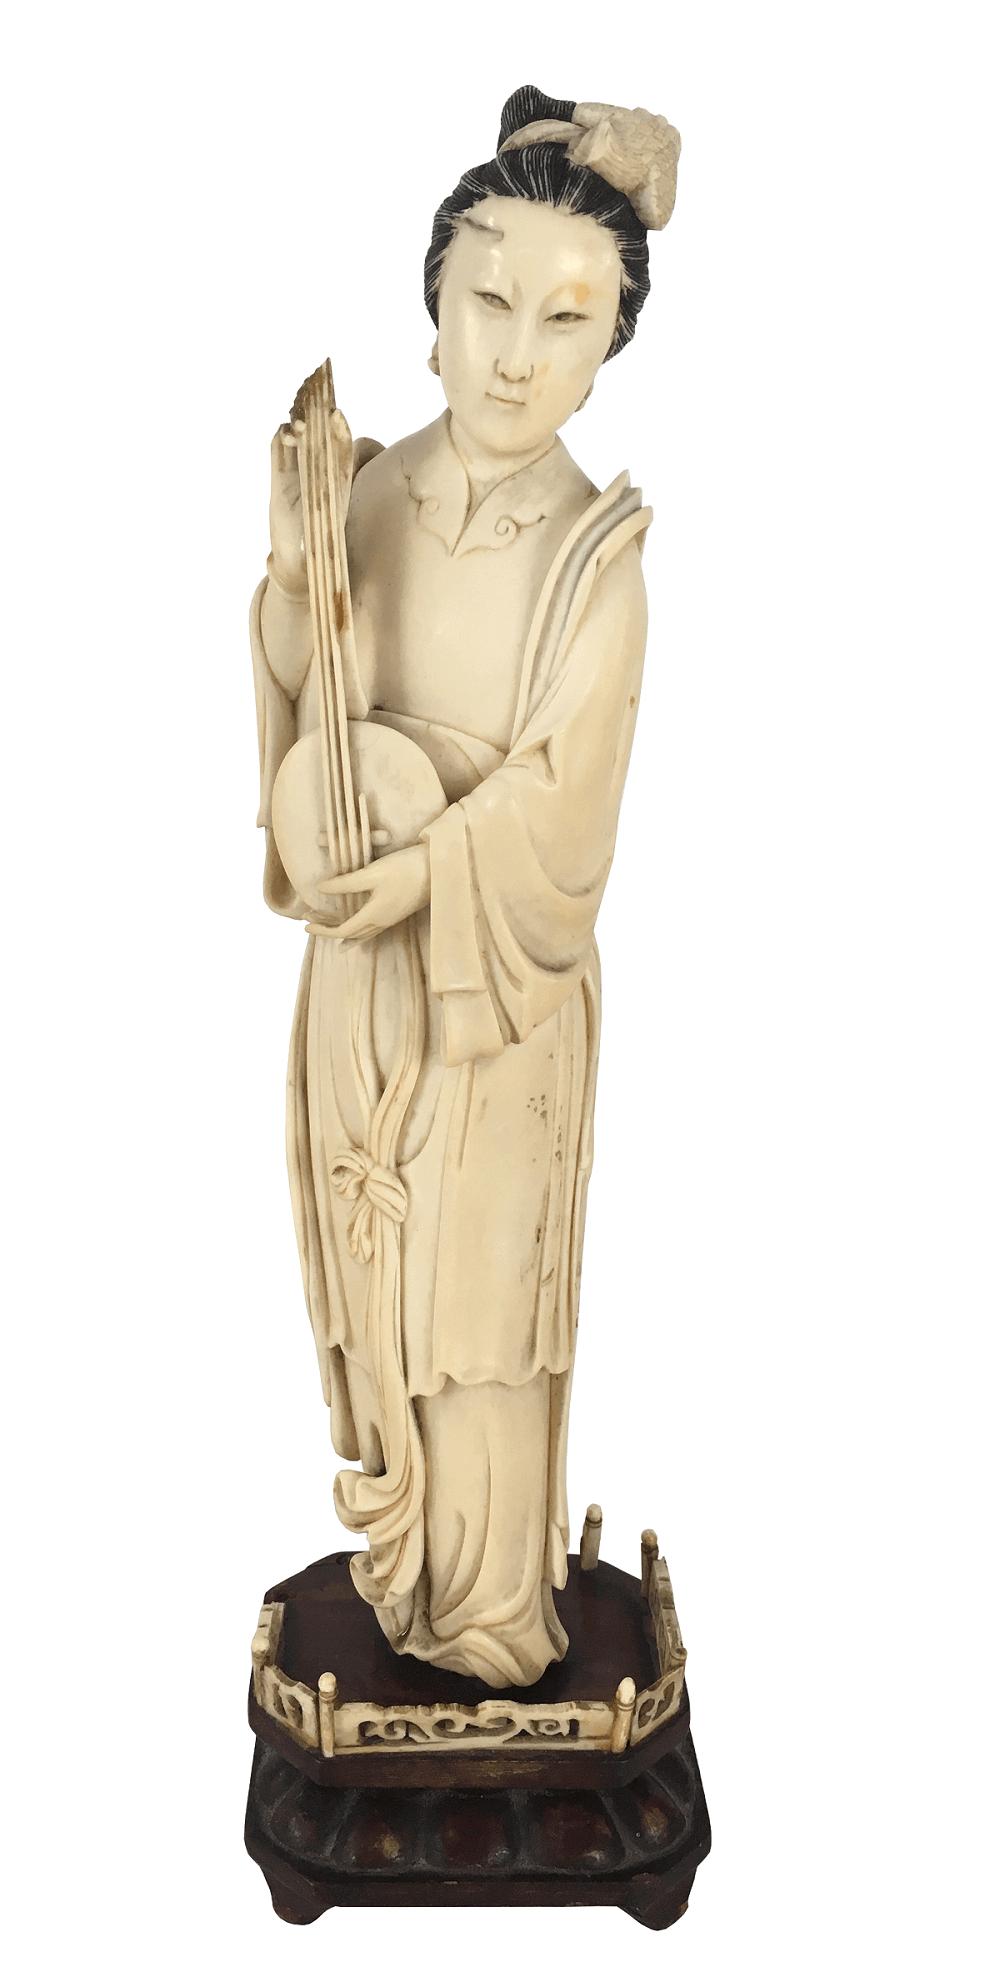 Grande Escultura Marfim Gueixa 32cm